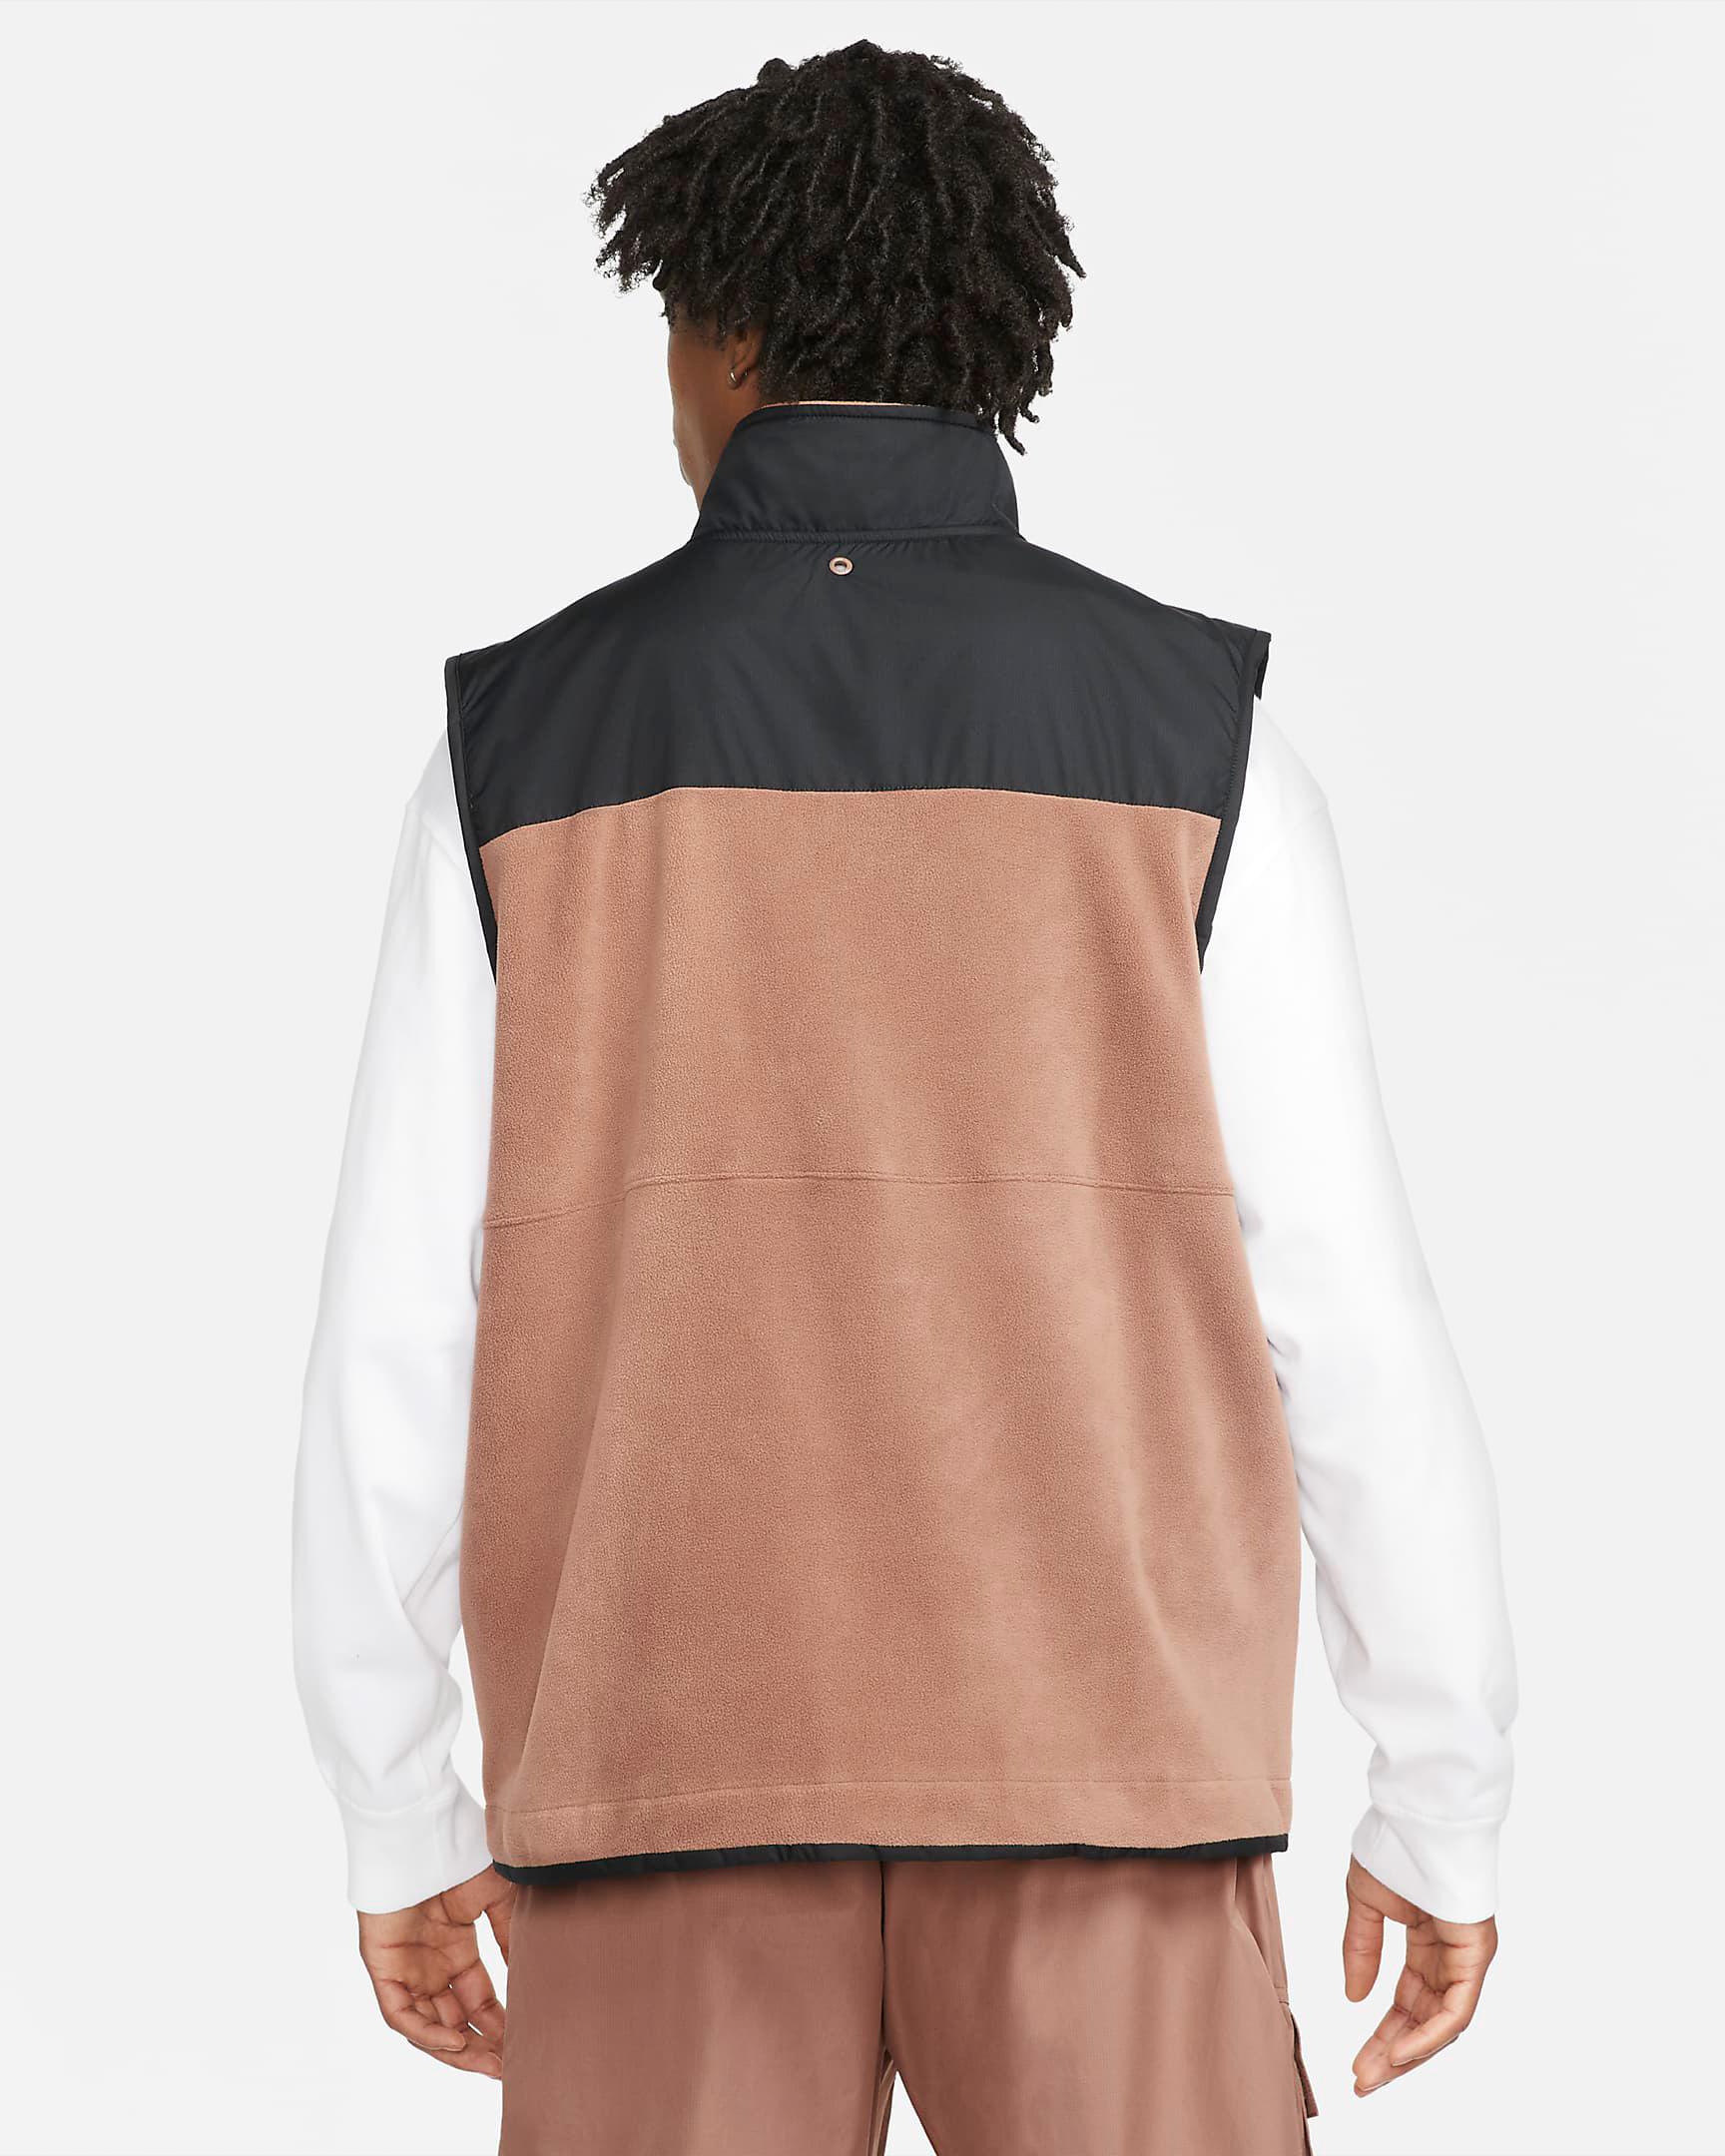 jordan-archaeo-brown-jumpman-vest-2